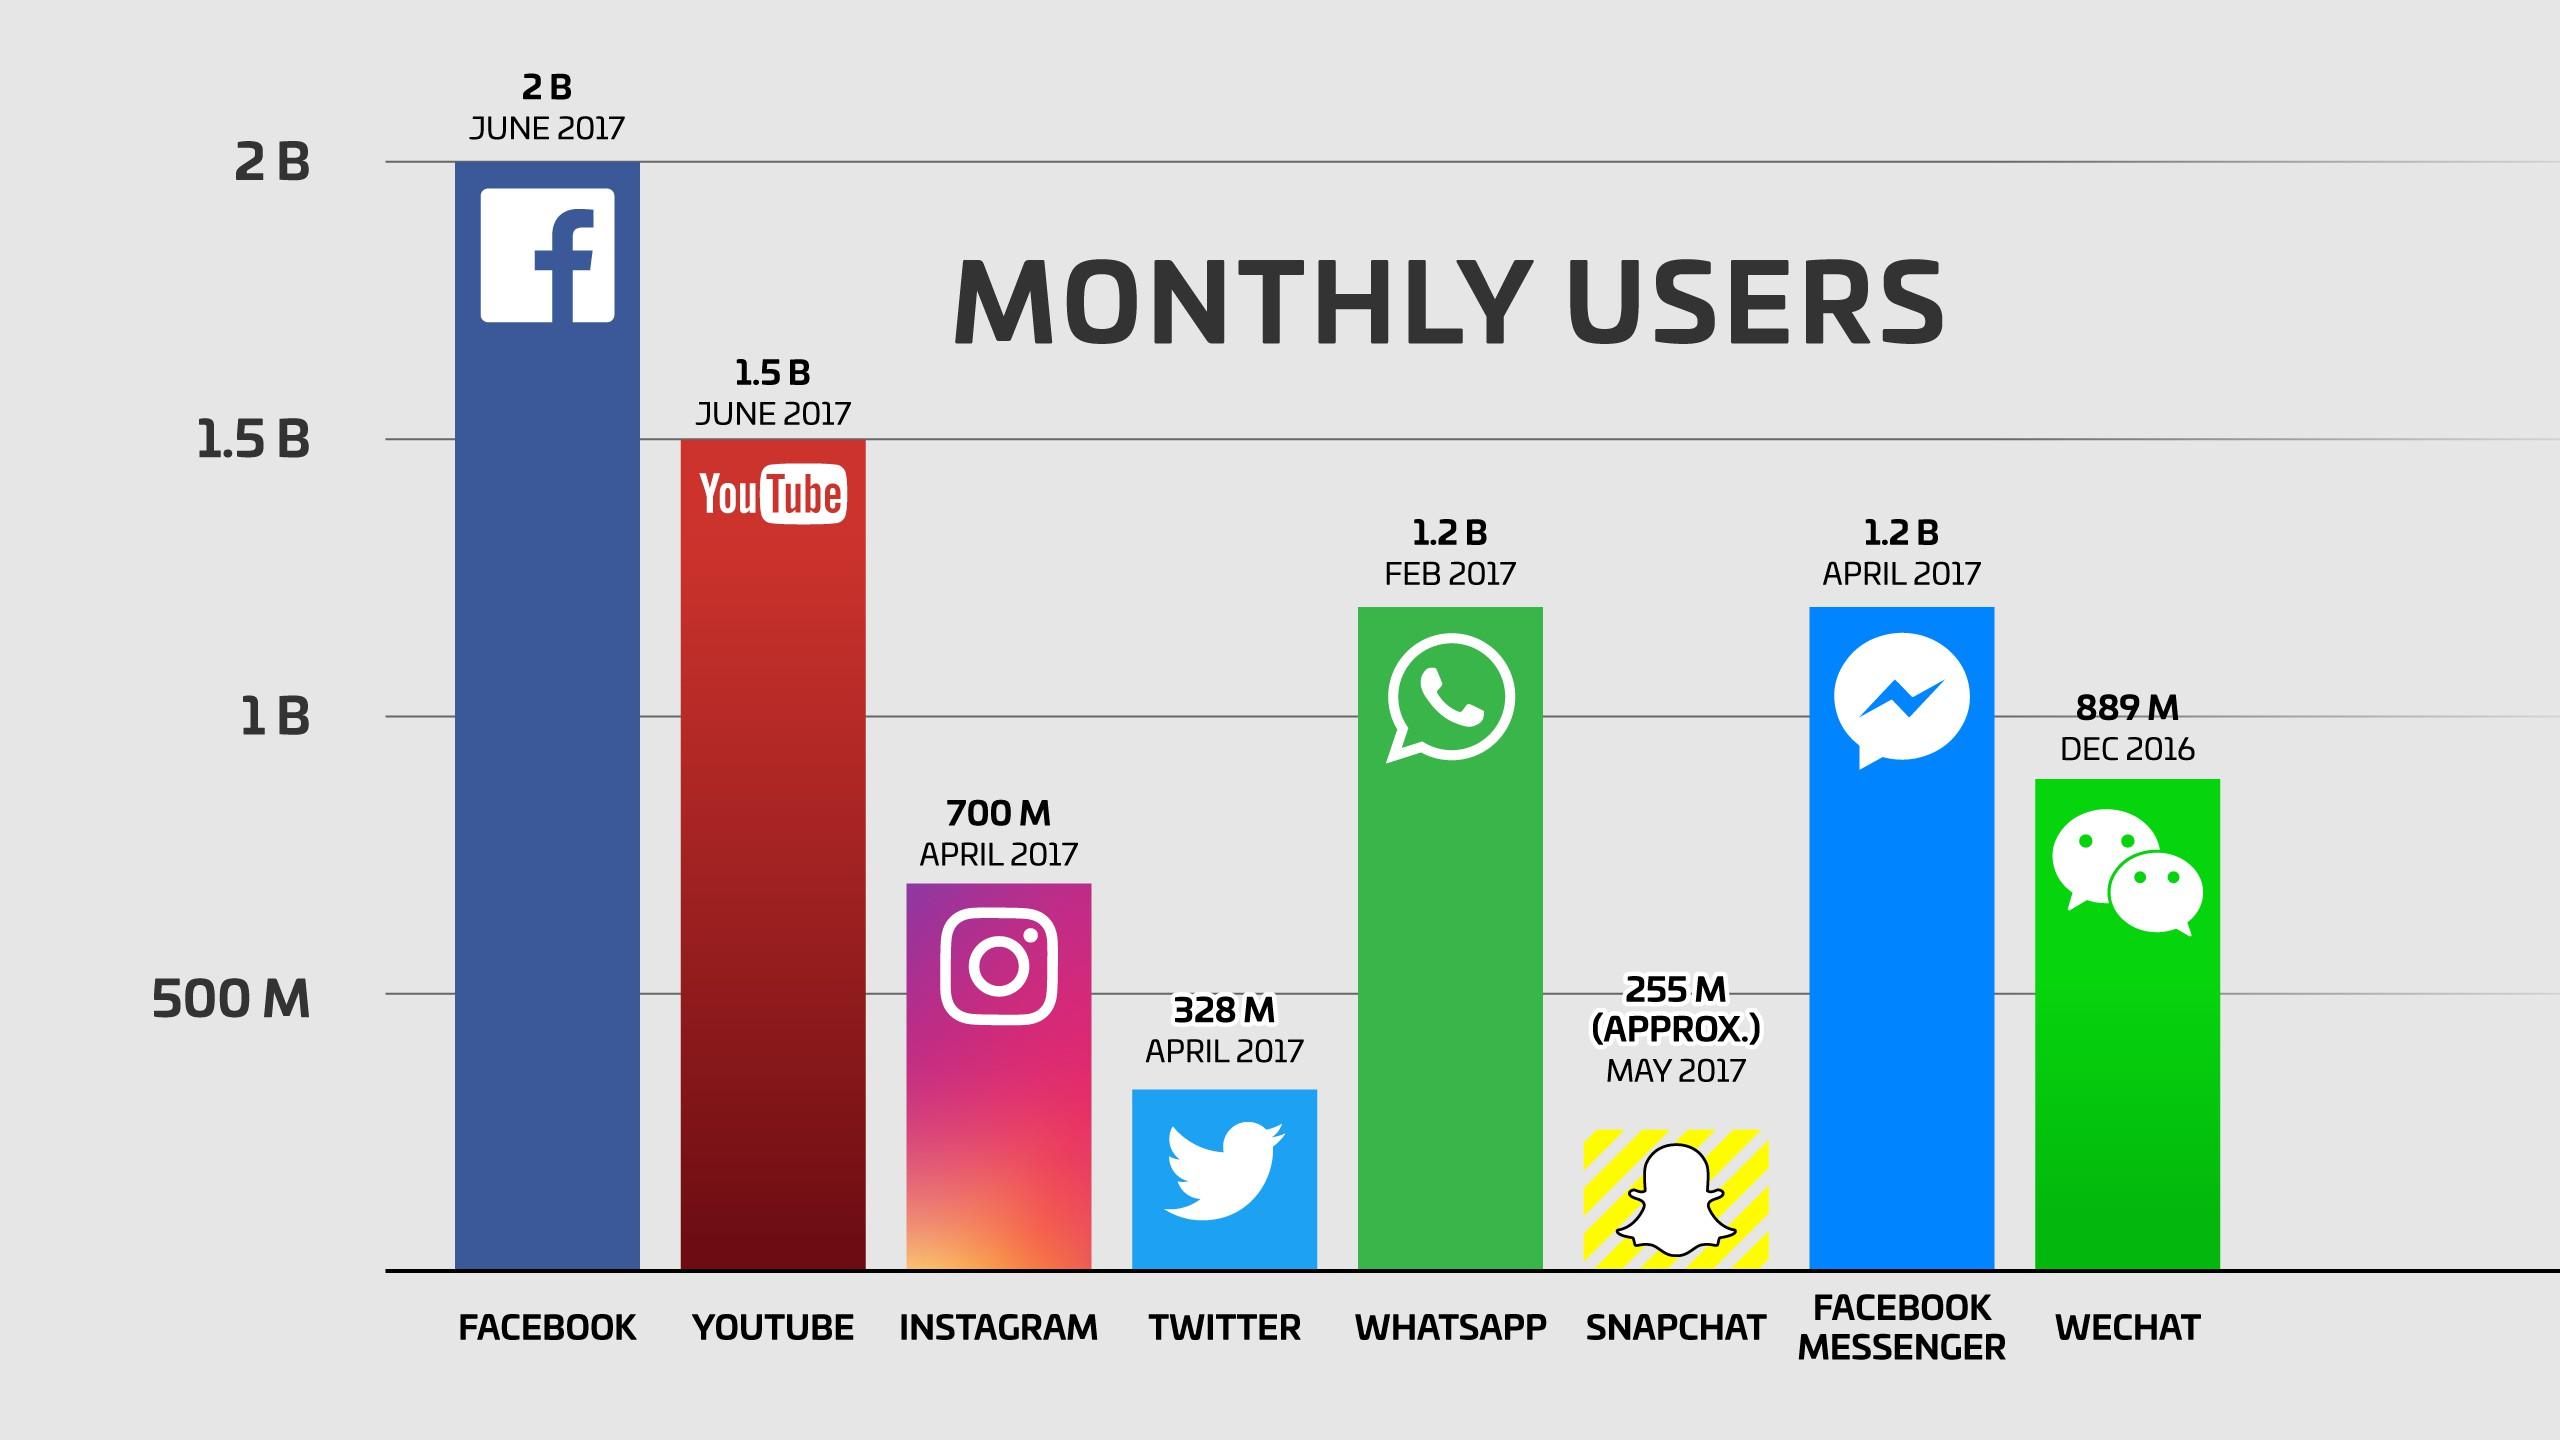 Facebook มีผู้ใช้งาน 2 พันล้านคน แซงหน้าทุก Social Network